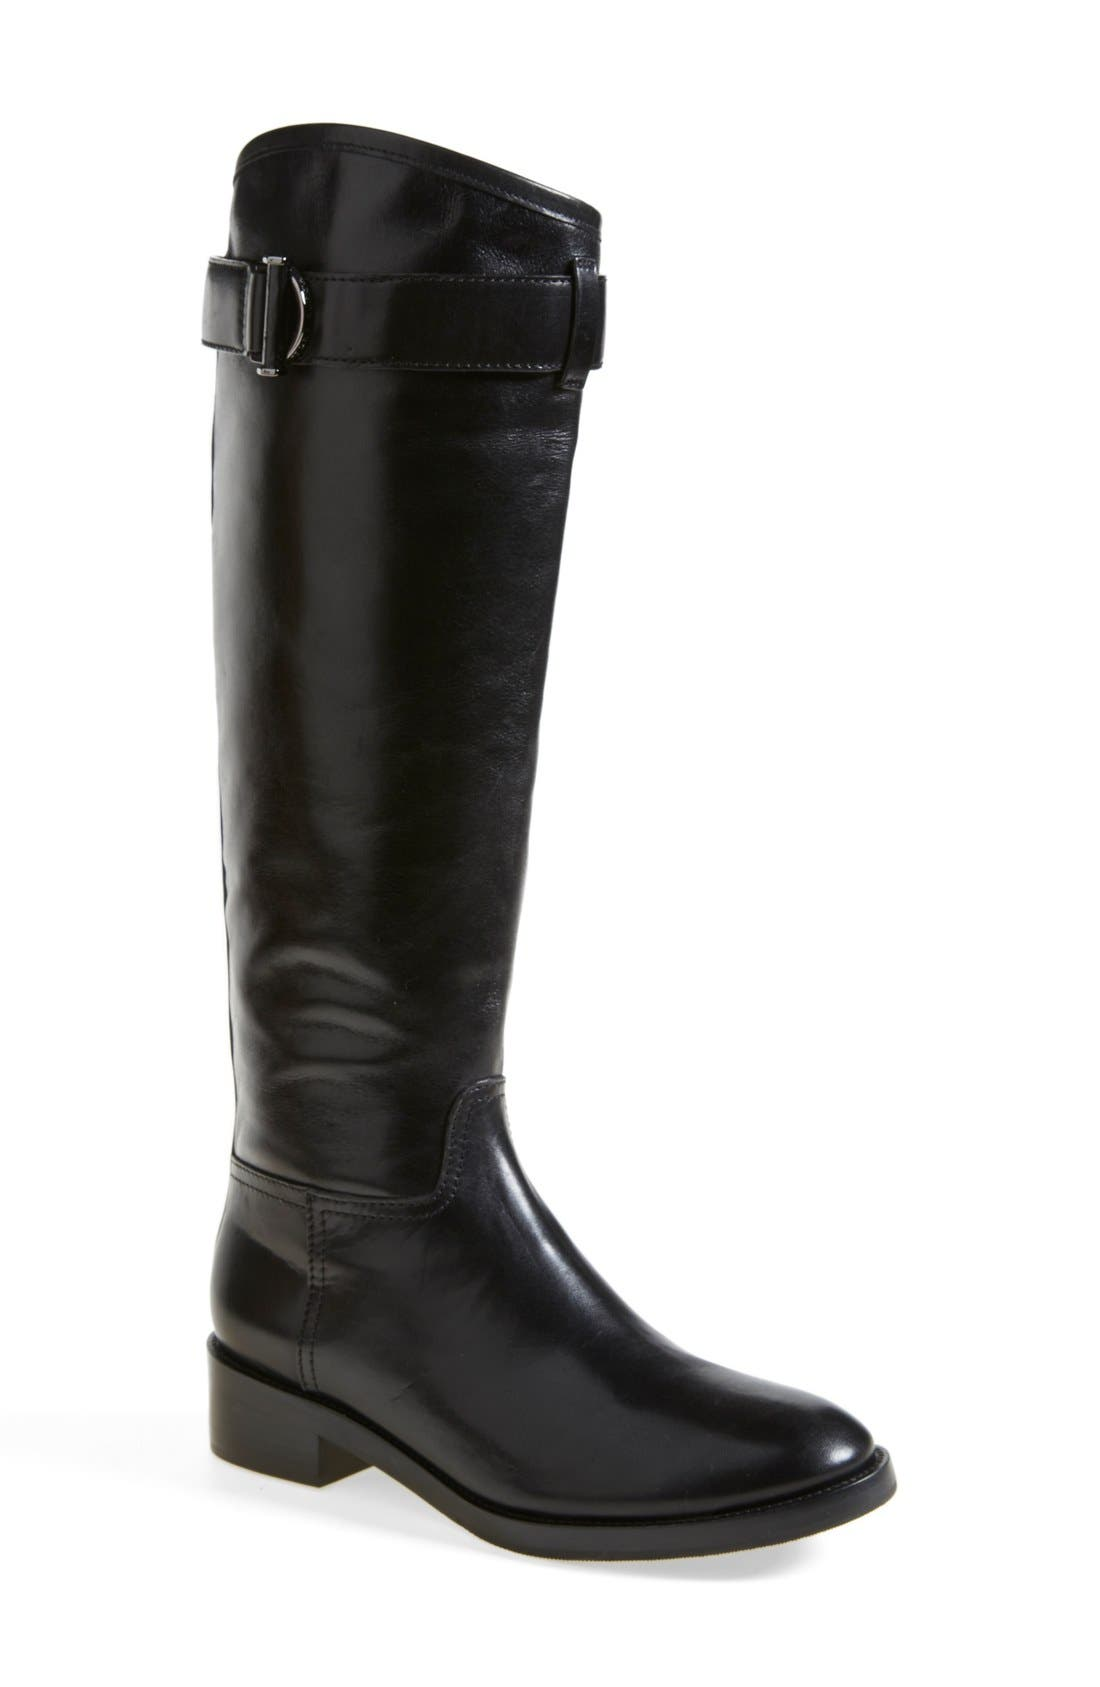 Alternate Image 1 Selected - Tory Burch 'Grace' Boot (Women)